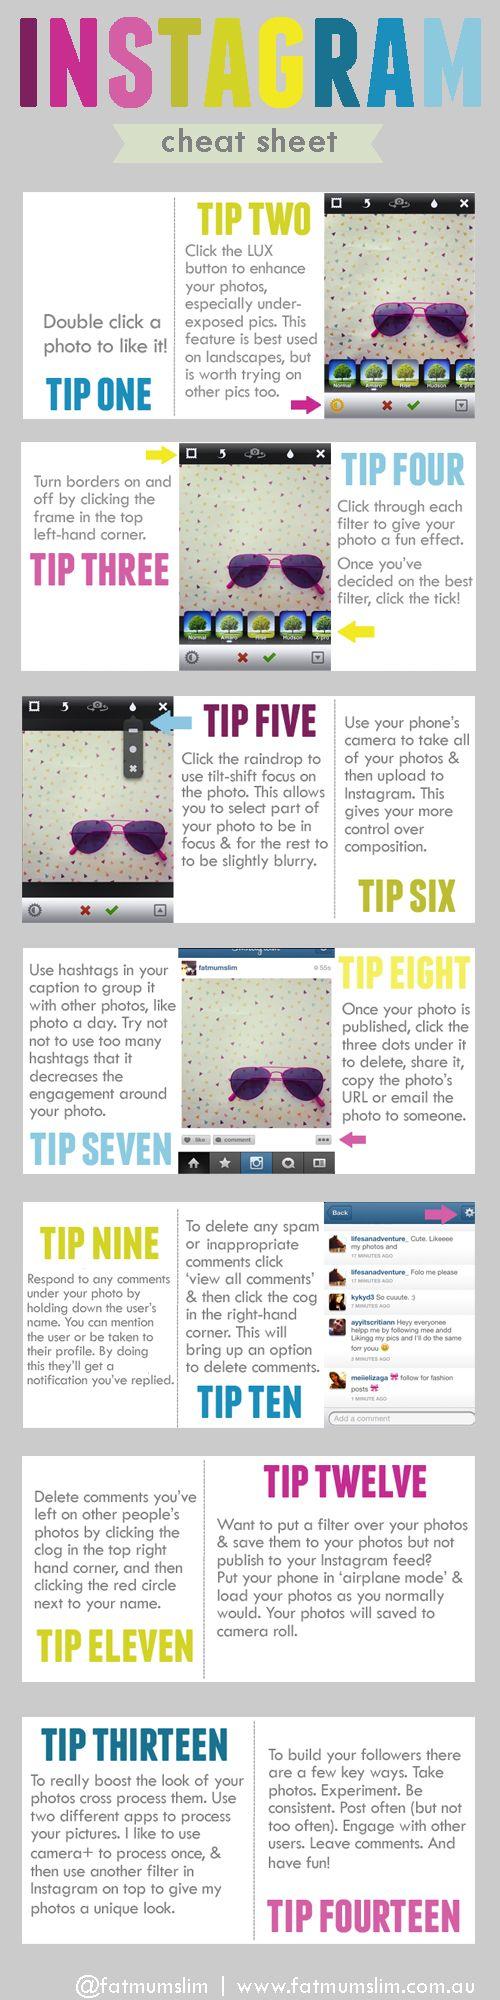 ultimate-instagram-cheat-sheet-1